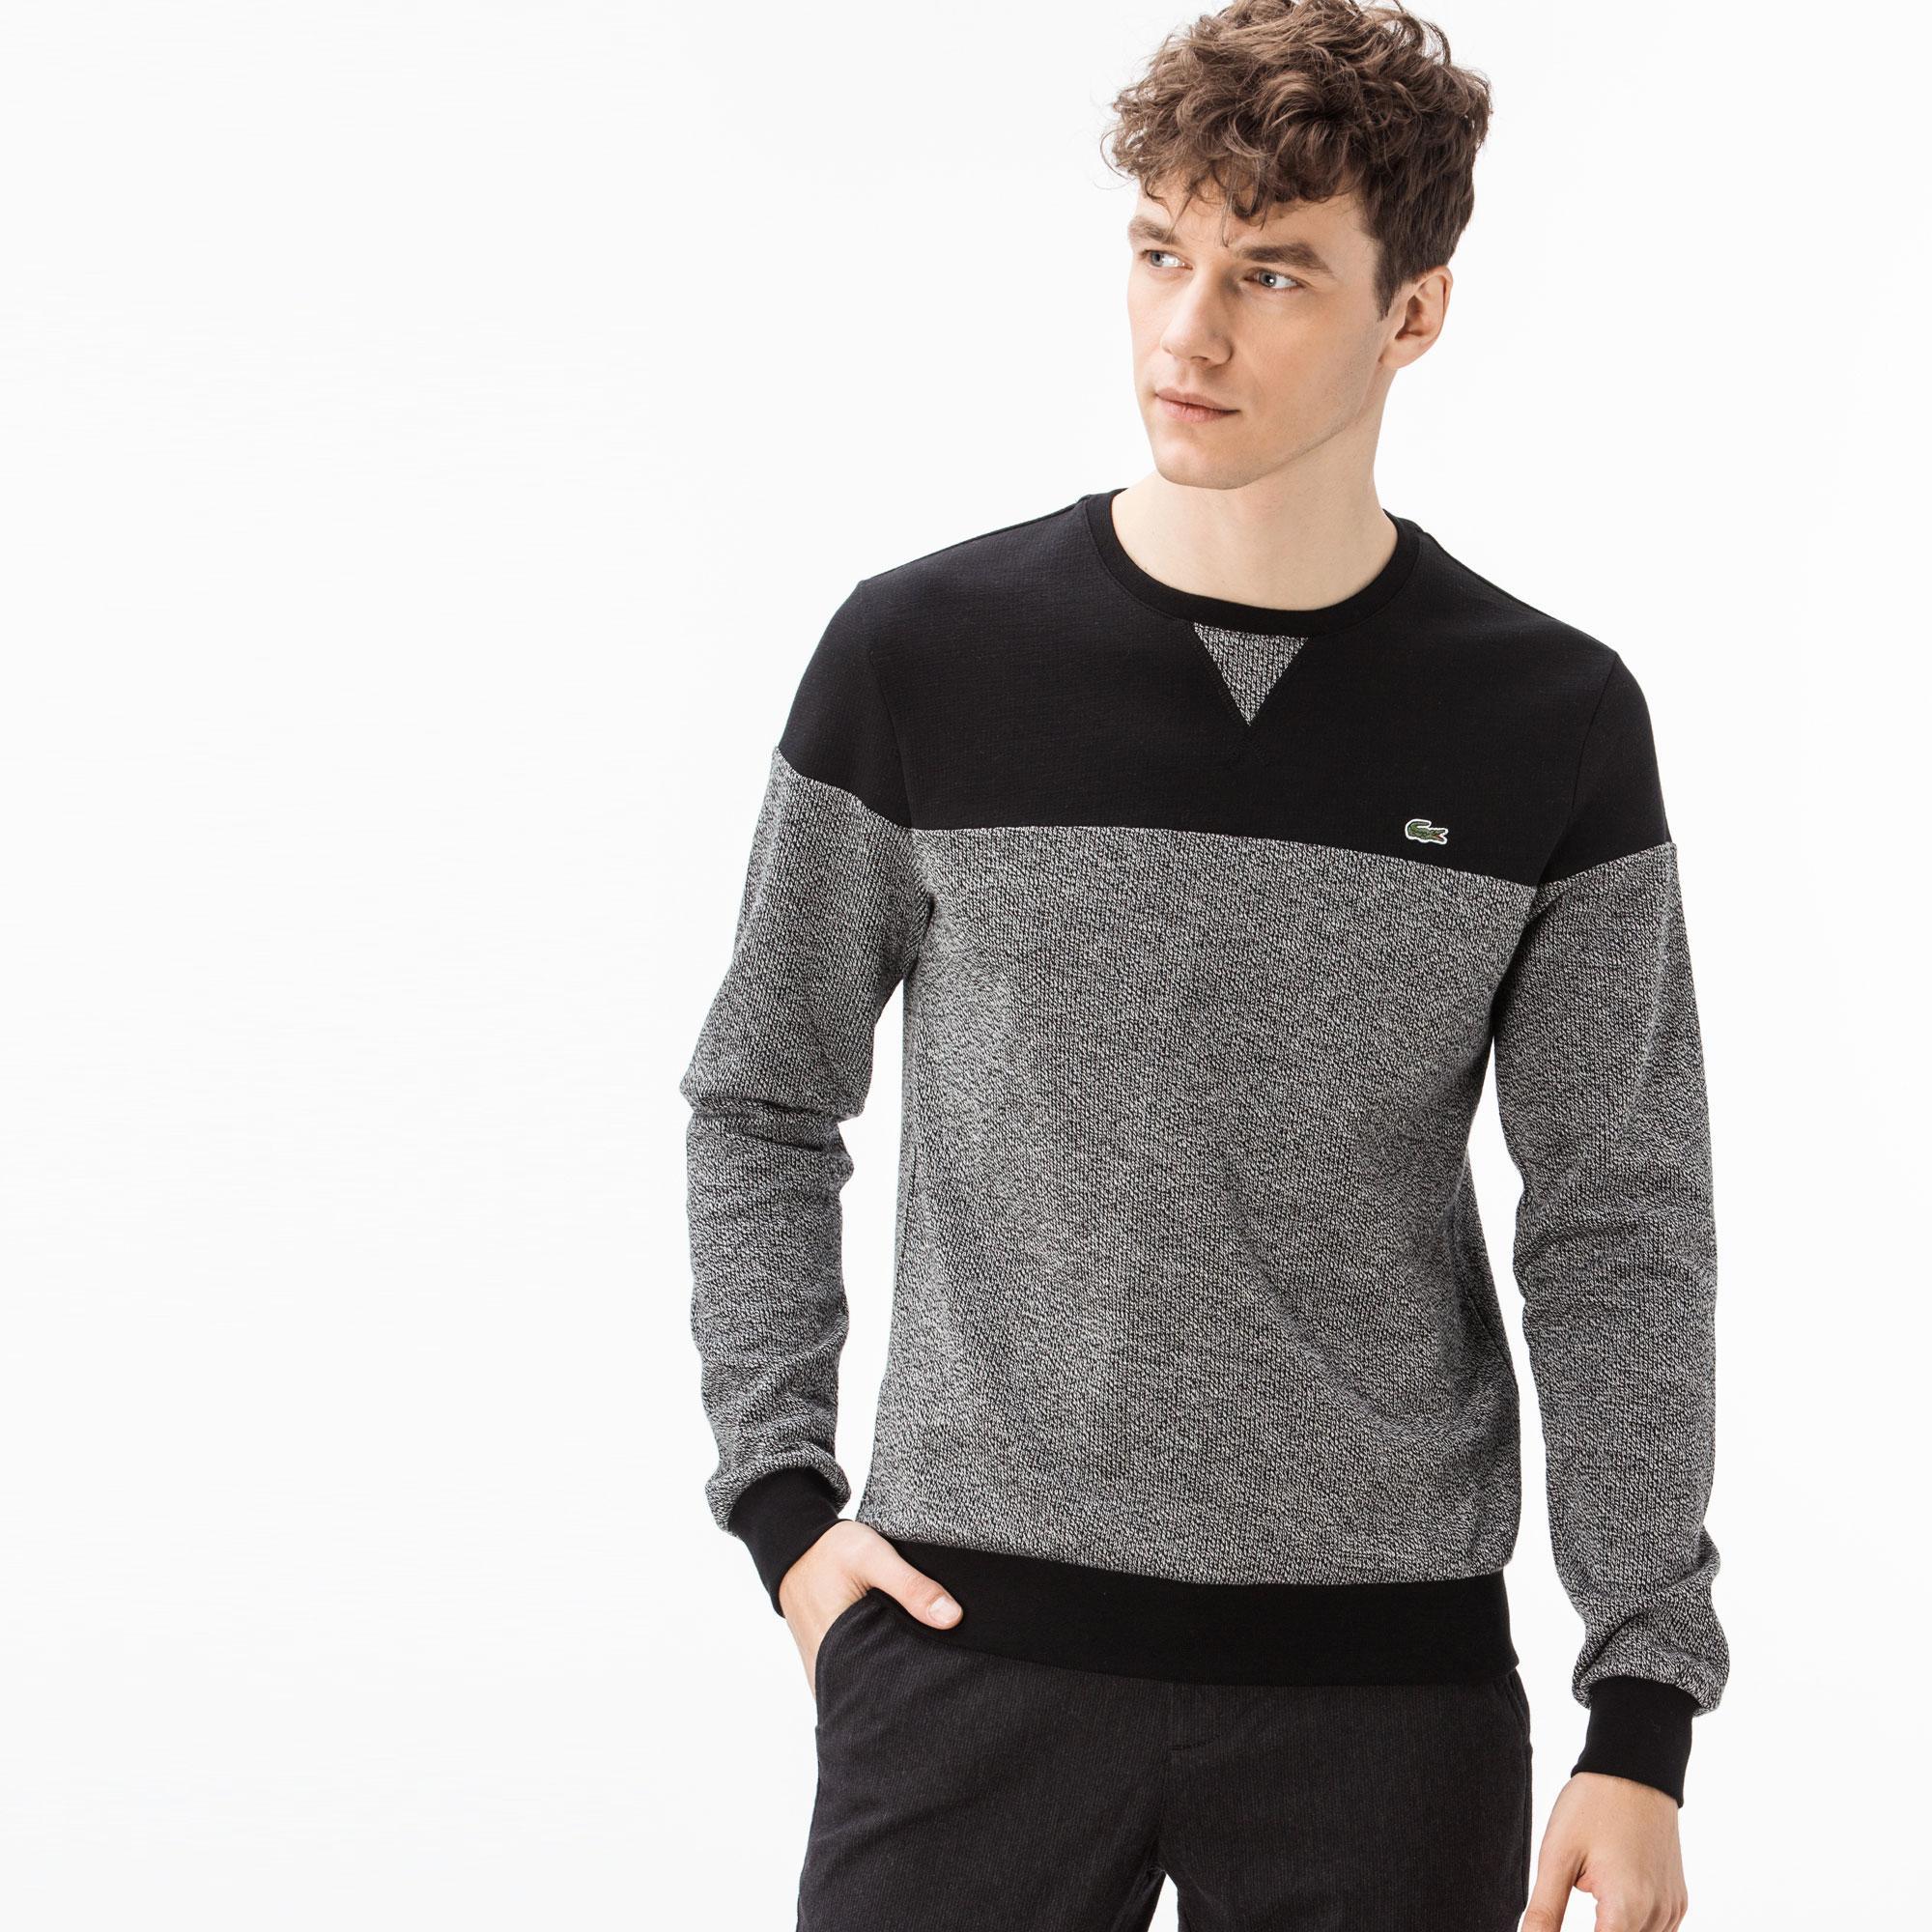 Lacoste Erkek Siyah-Gri T-Shirt